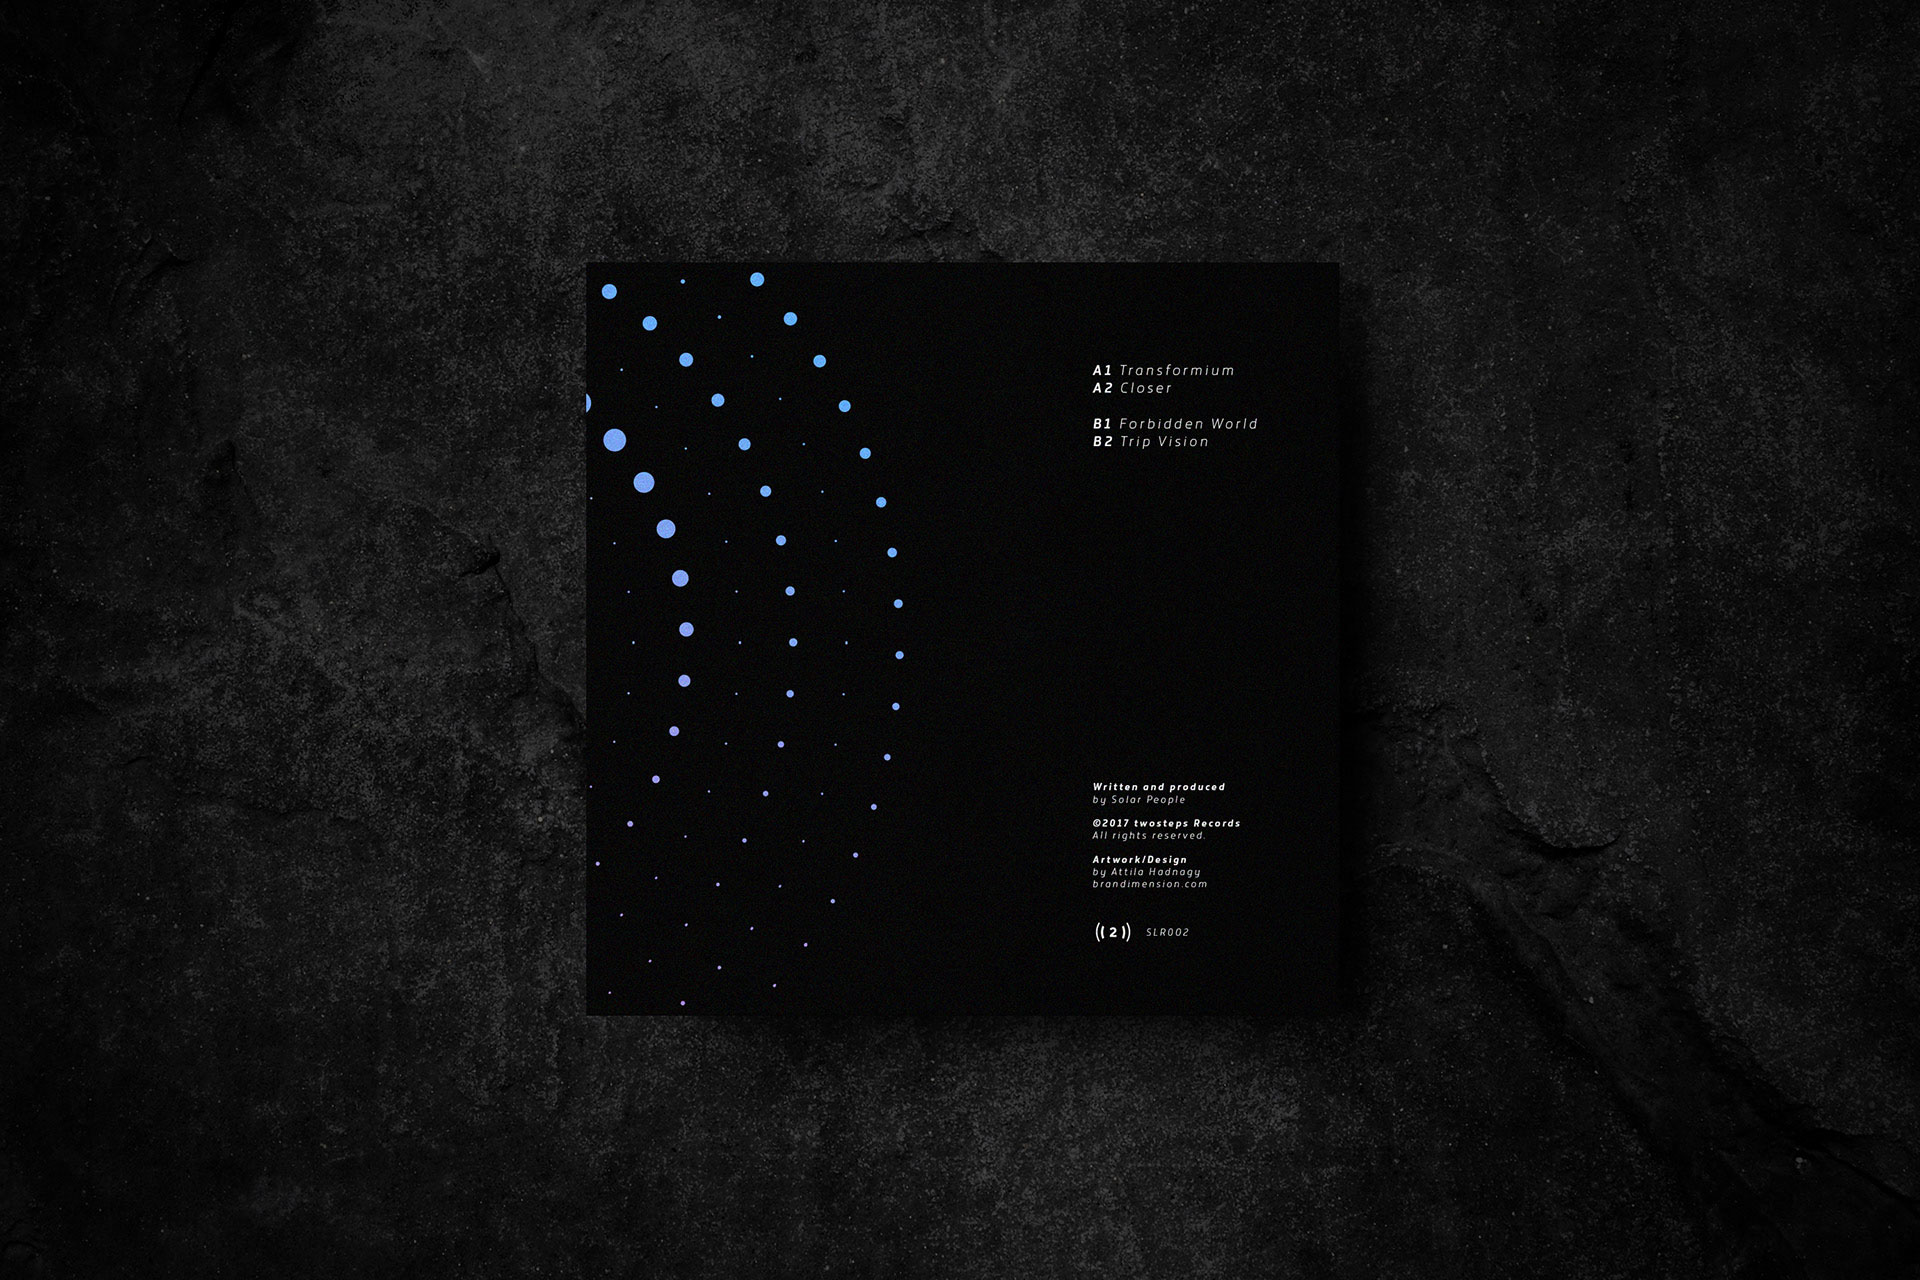 Solar People Vinyl cover design